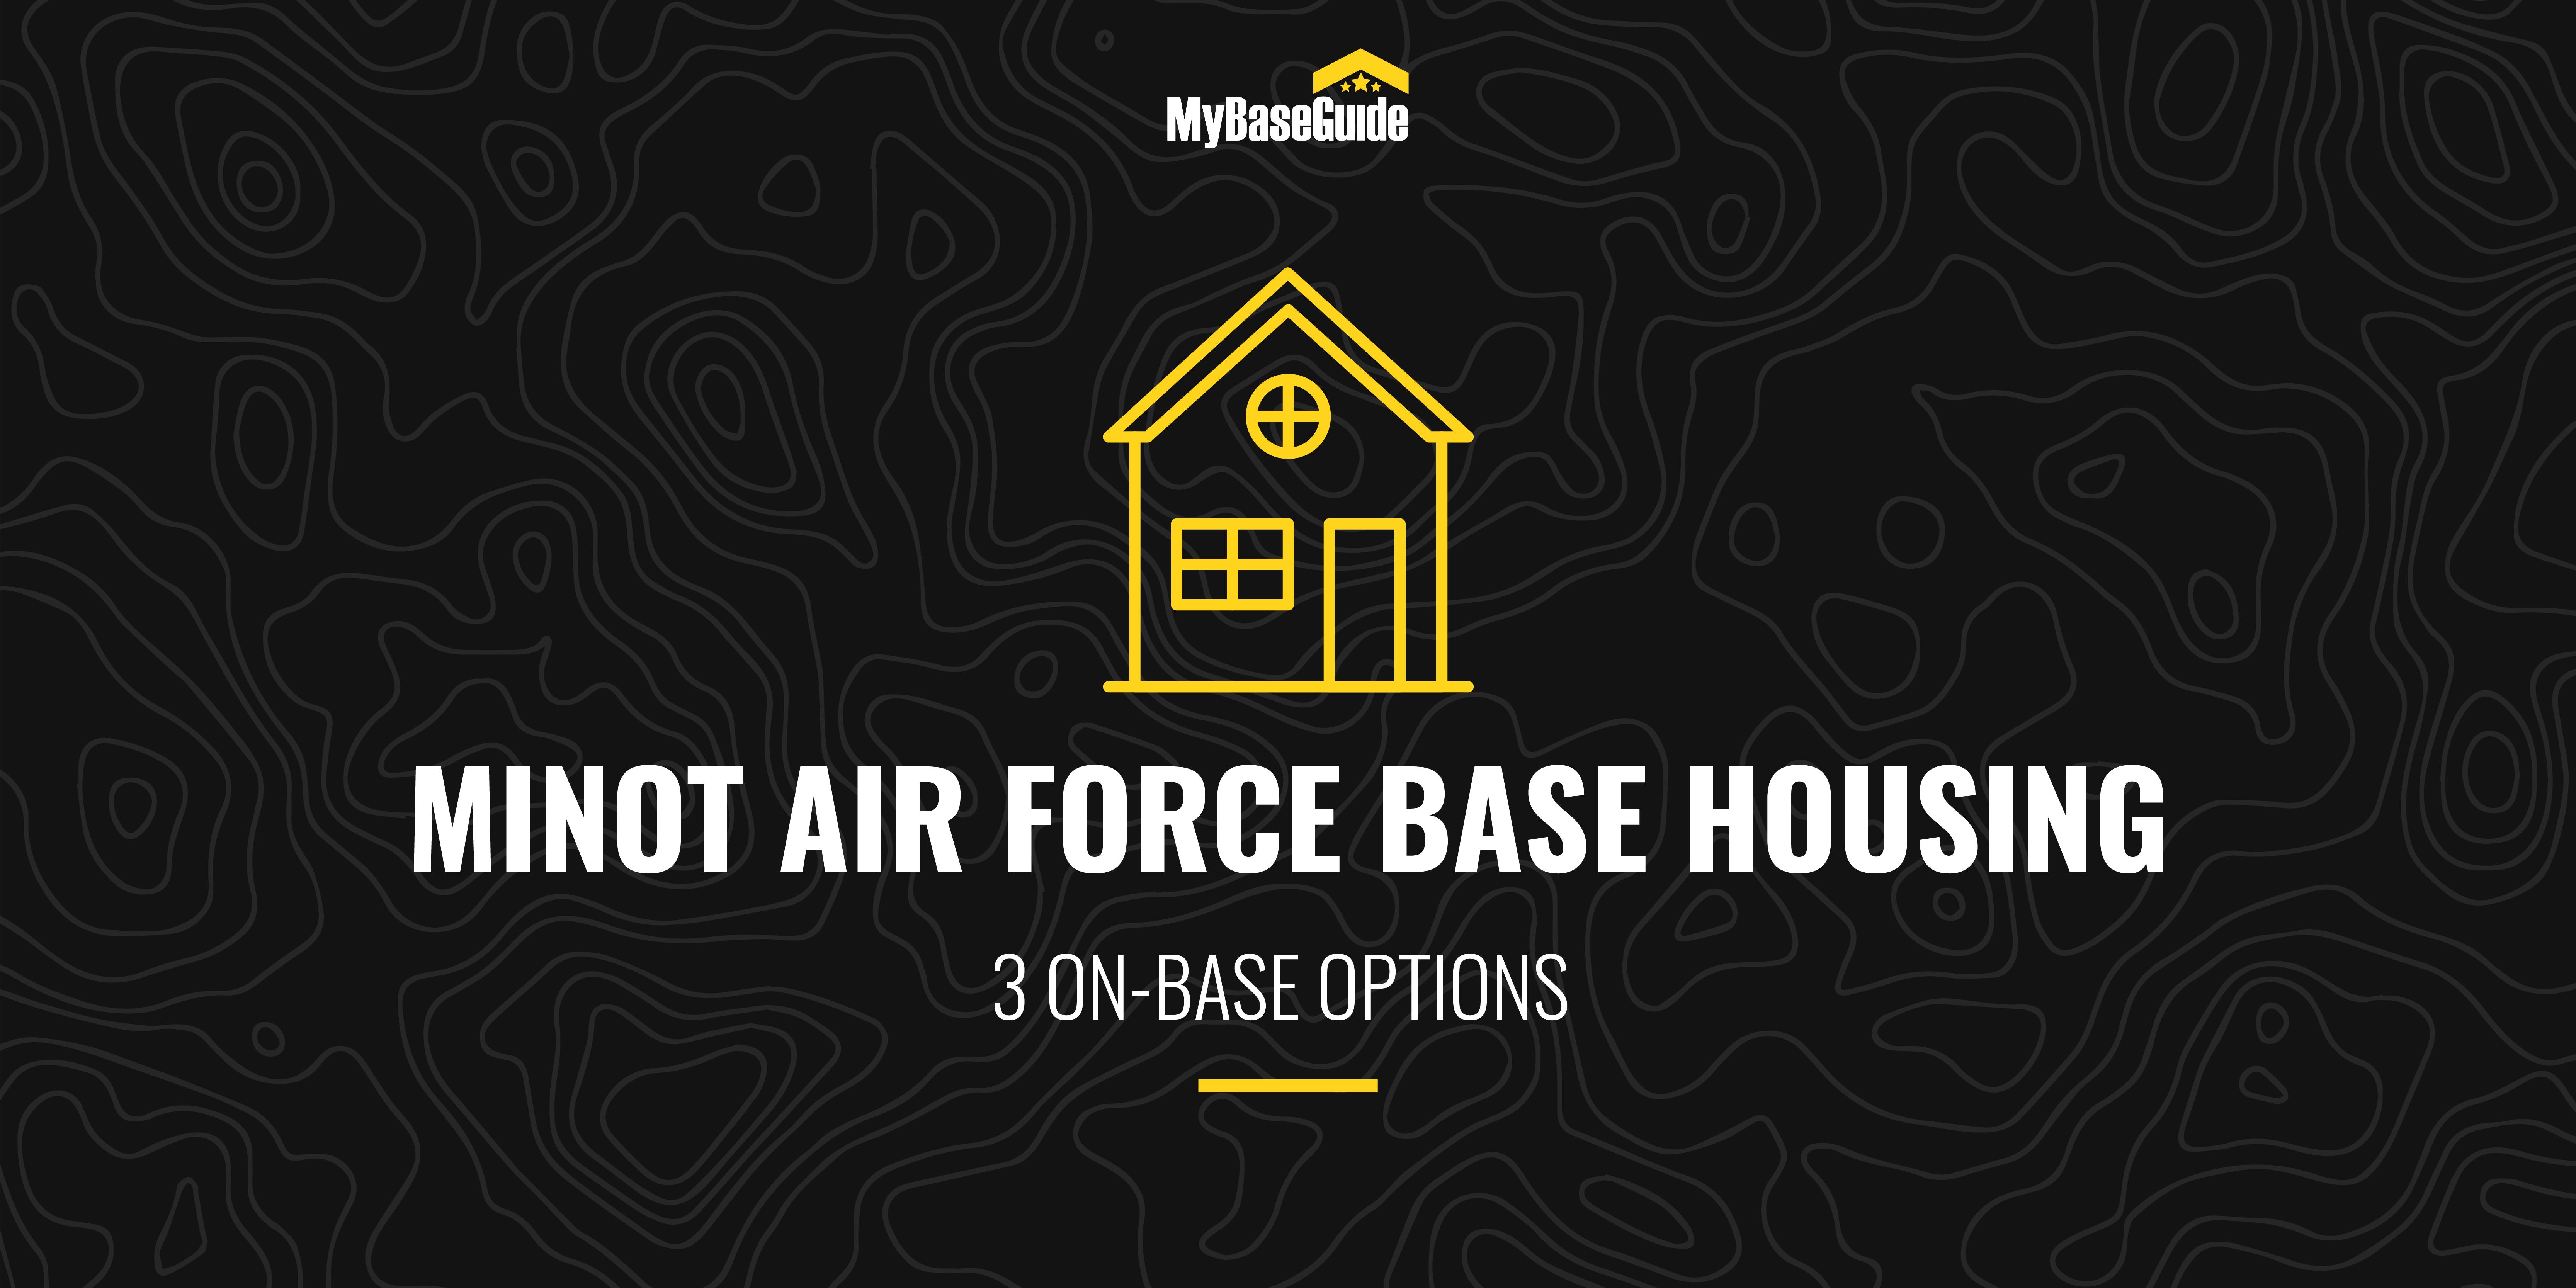 Minot AFB Housing: 3 On-Base Options